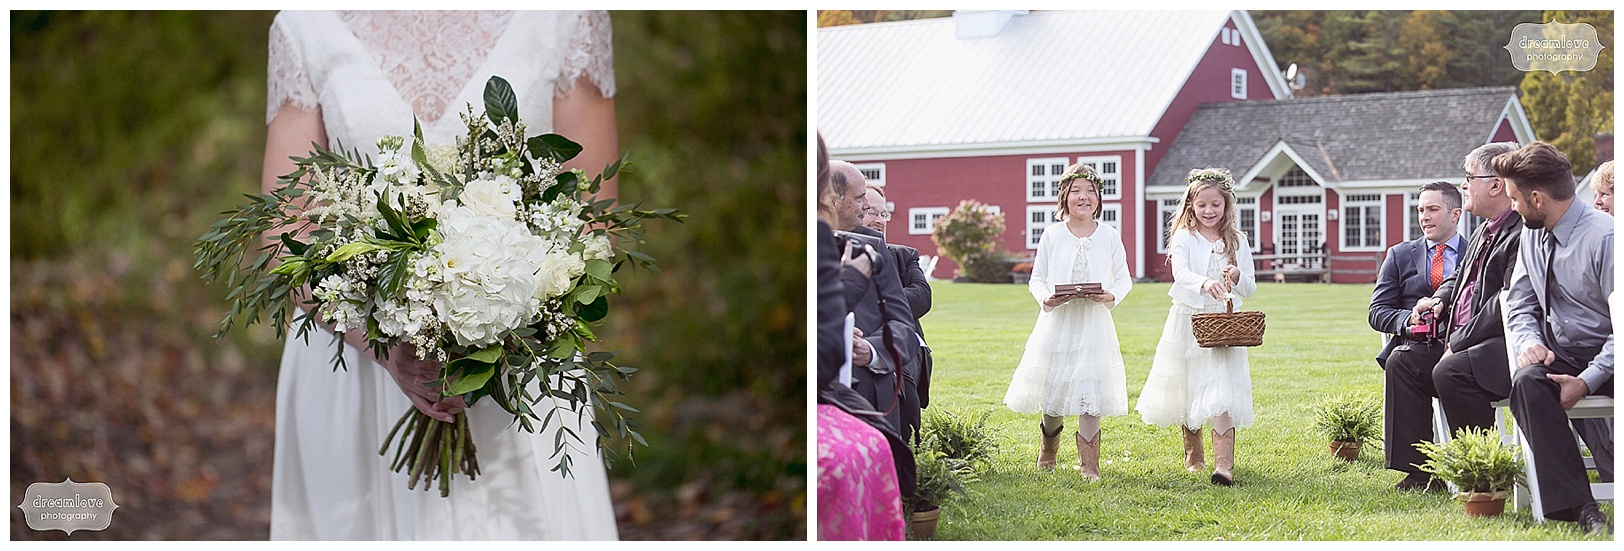 Riverside_Vermont_Wedding_Venue_0106